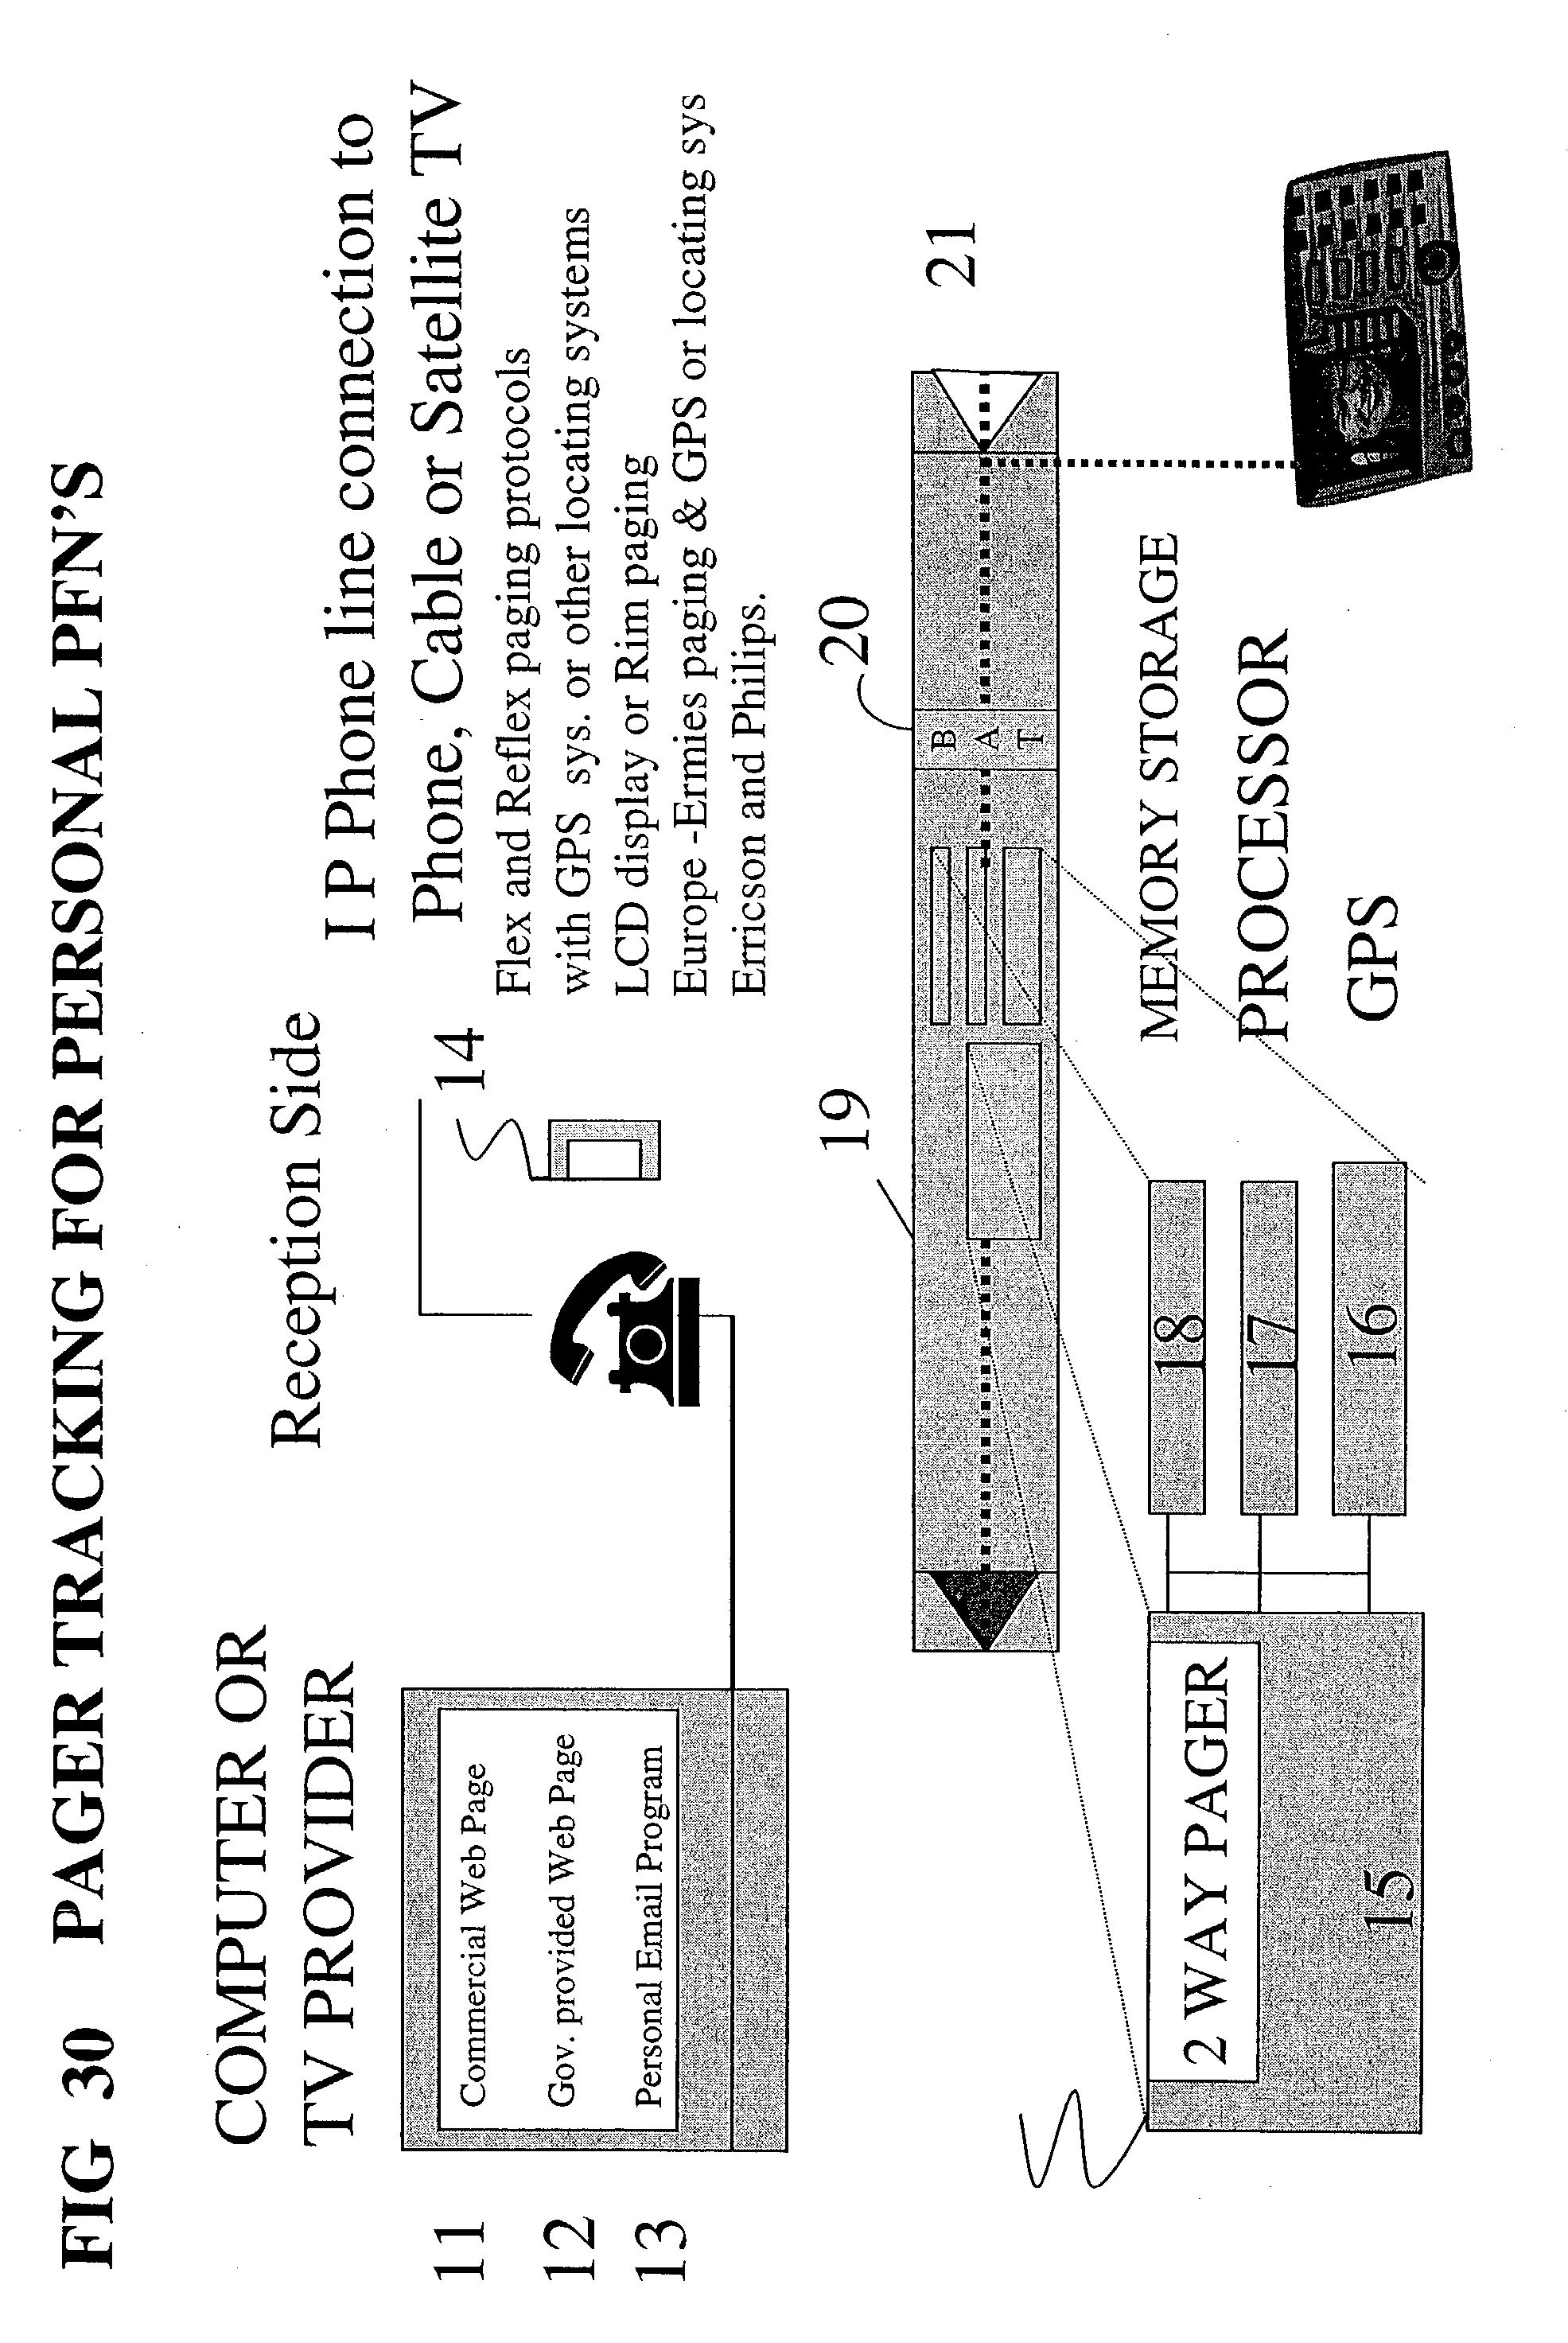 Patent US 20030093187A1